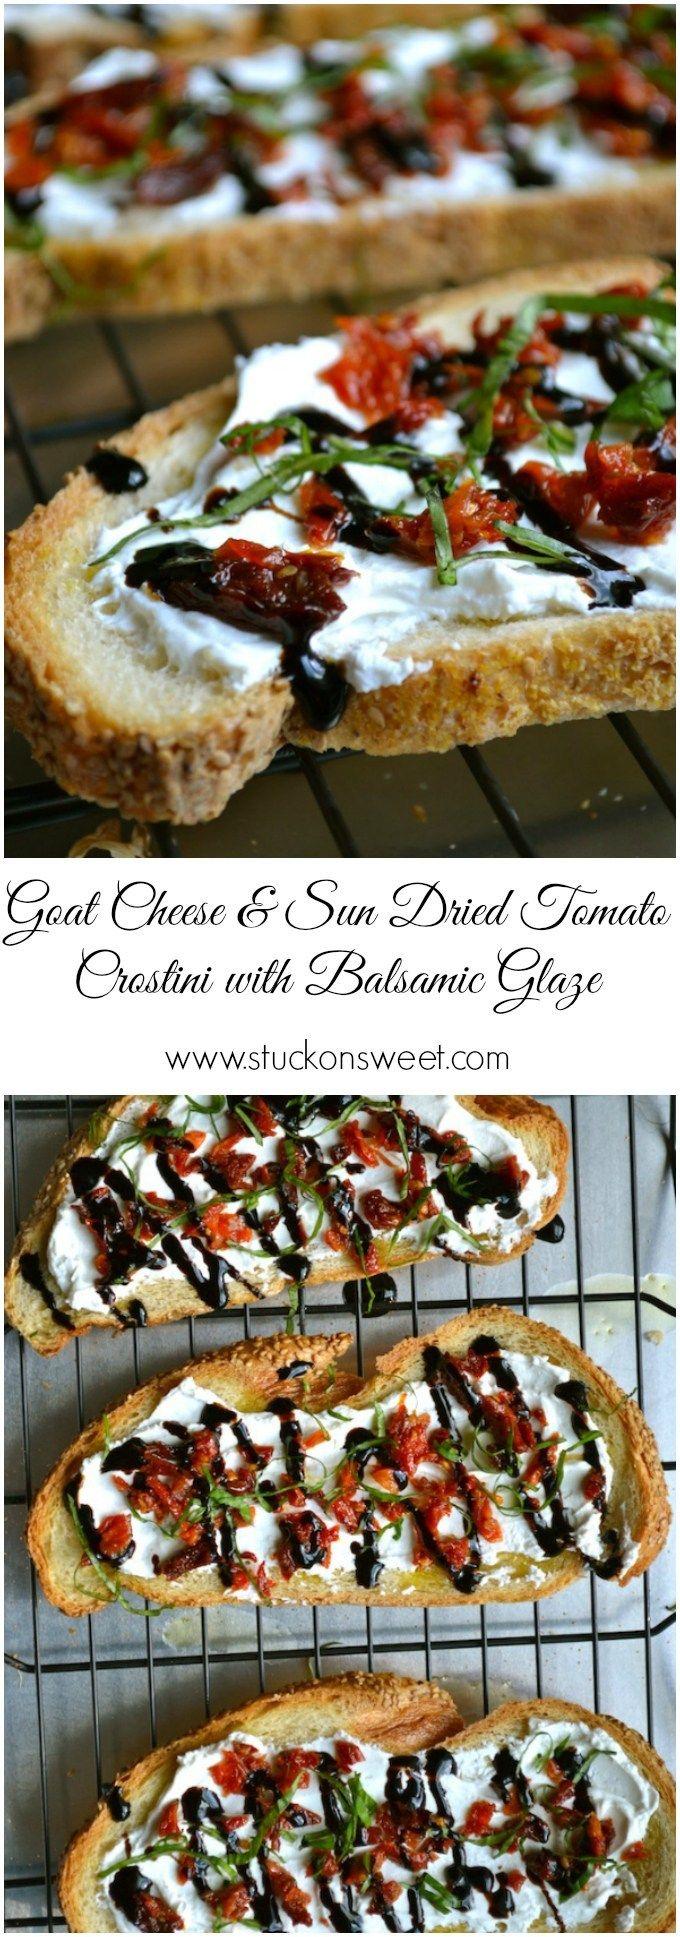 Goat Cheese & Sun Dried Tomato Crostini with Balsamic Glaze | www.stuckonsweet.com - Stuck On Sweet